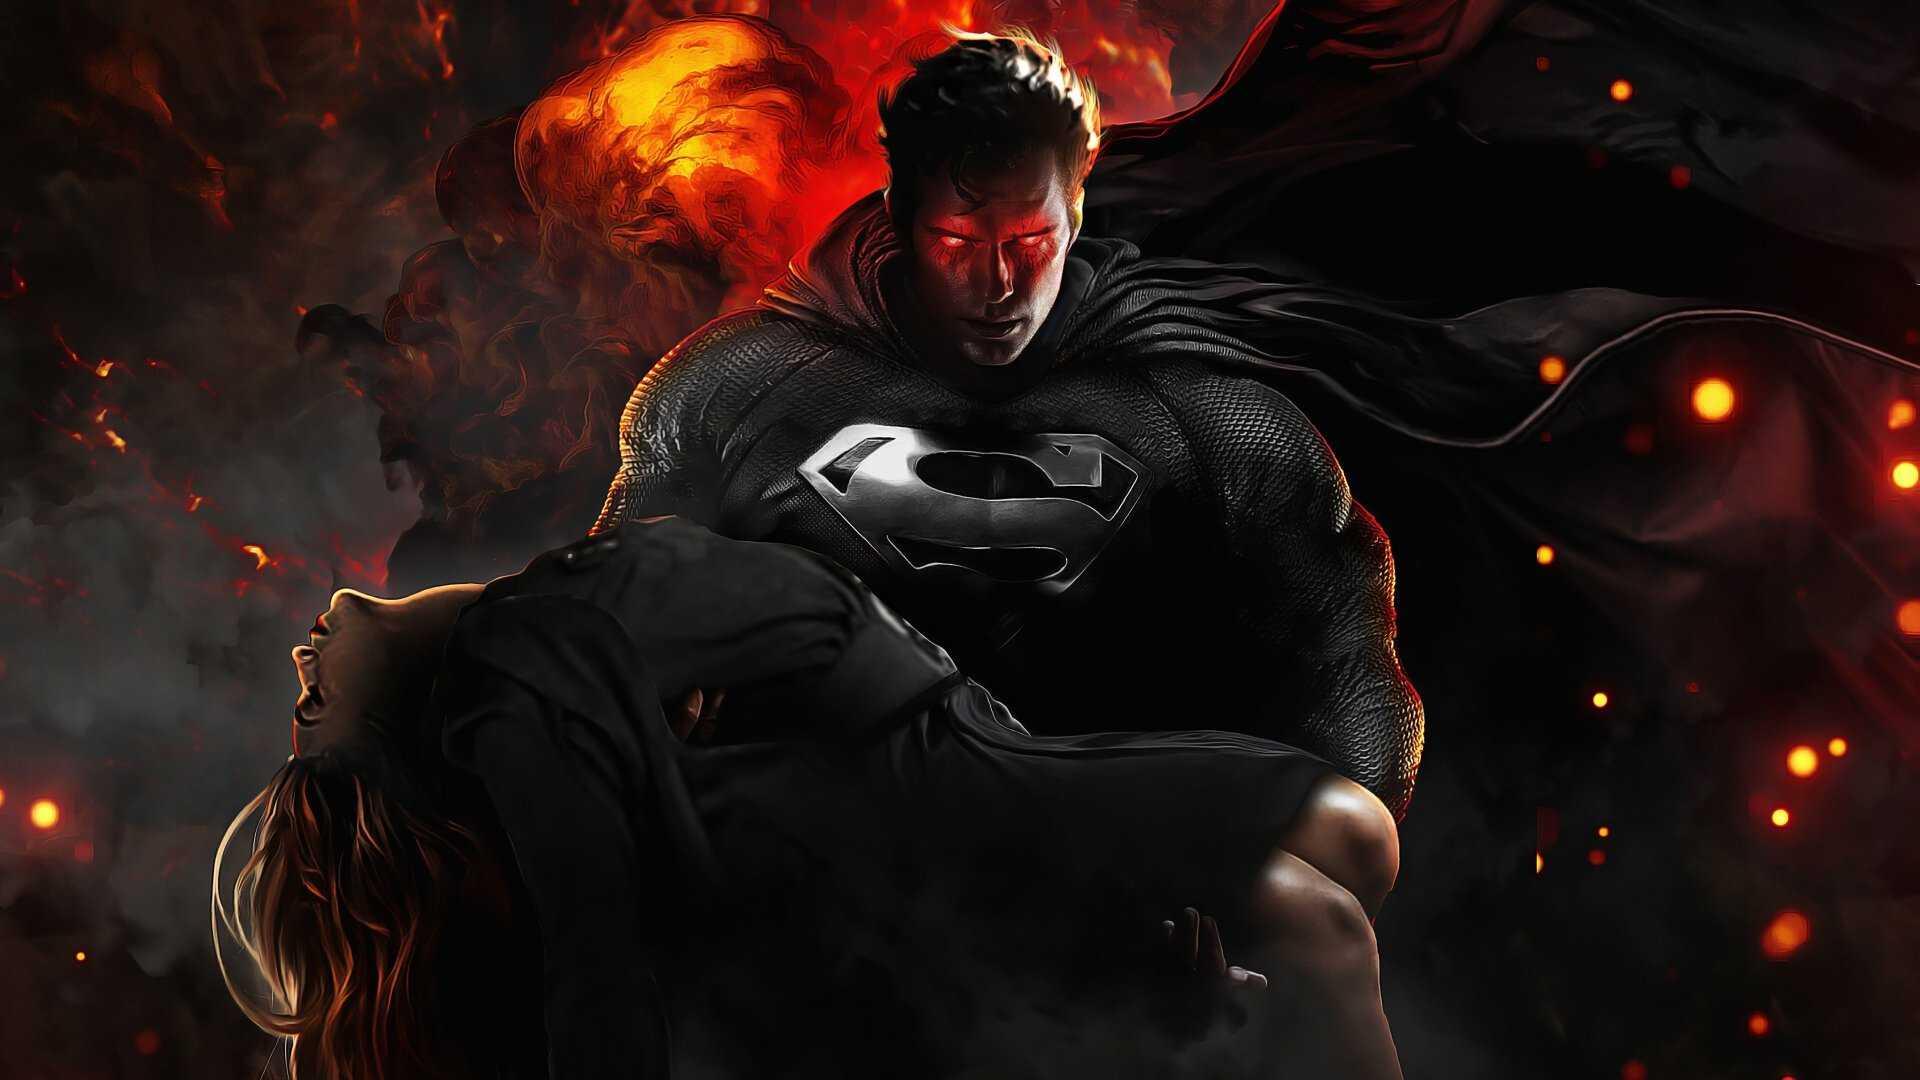 Confira o trailer final do filme: Zack Snyder's Justice League